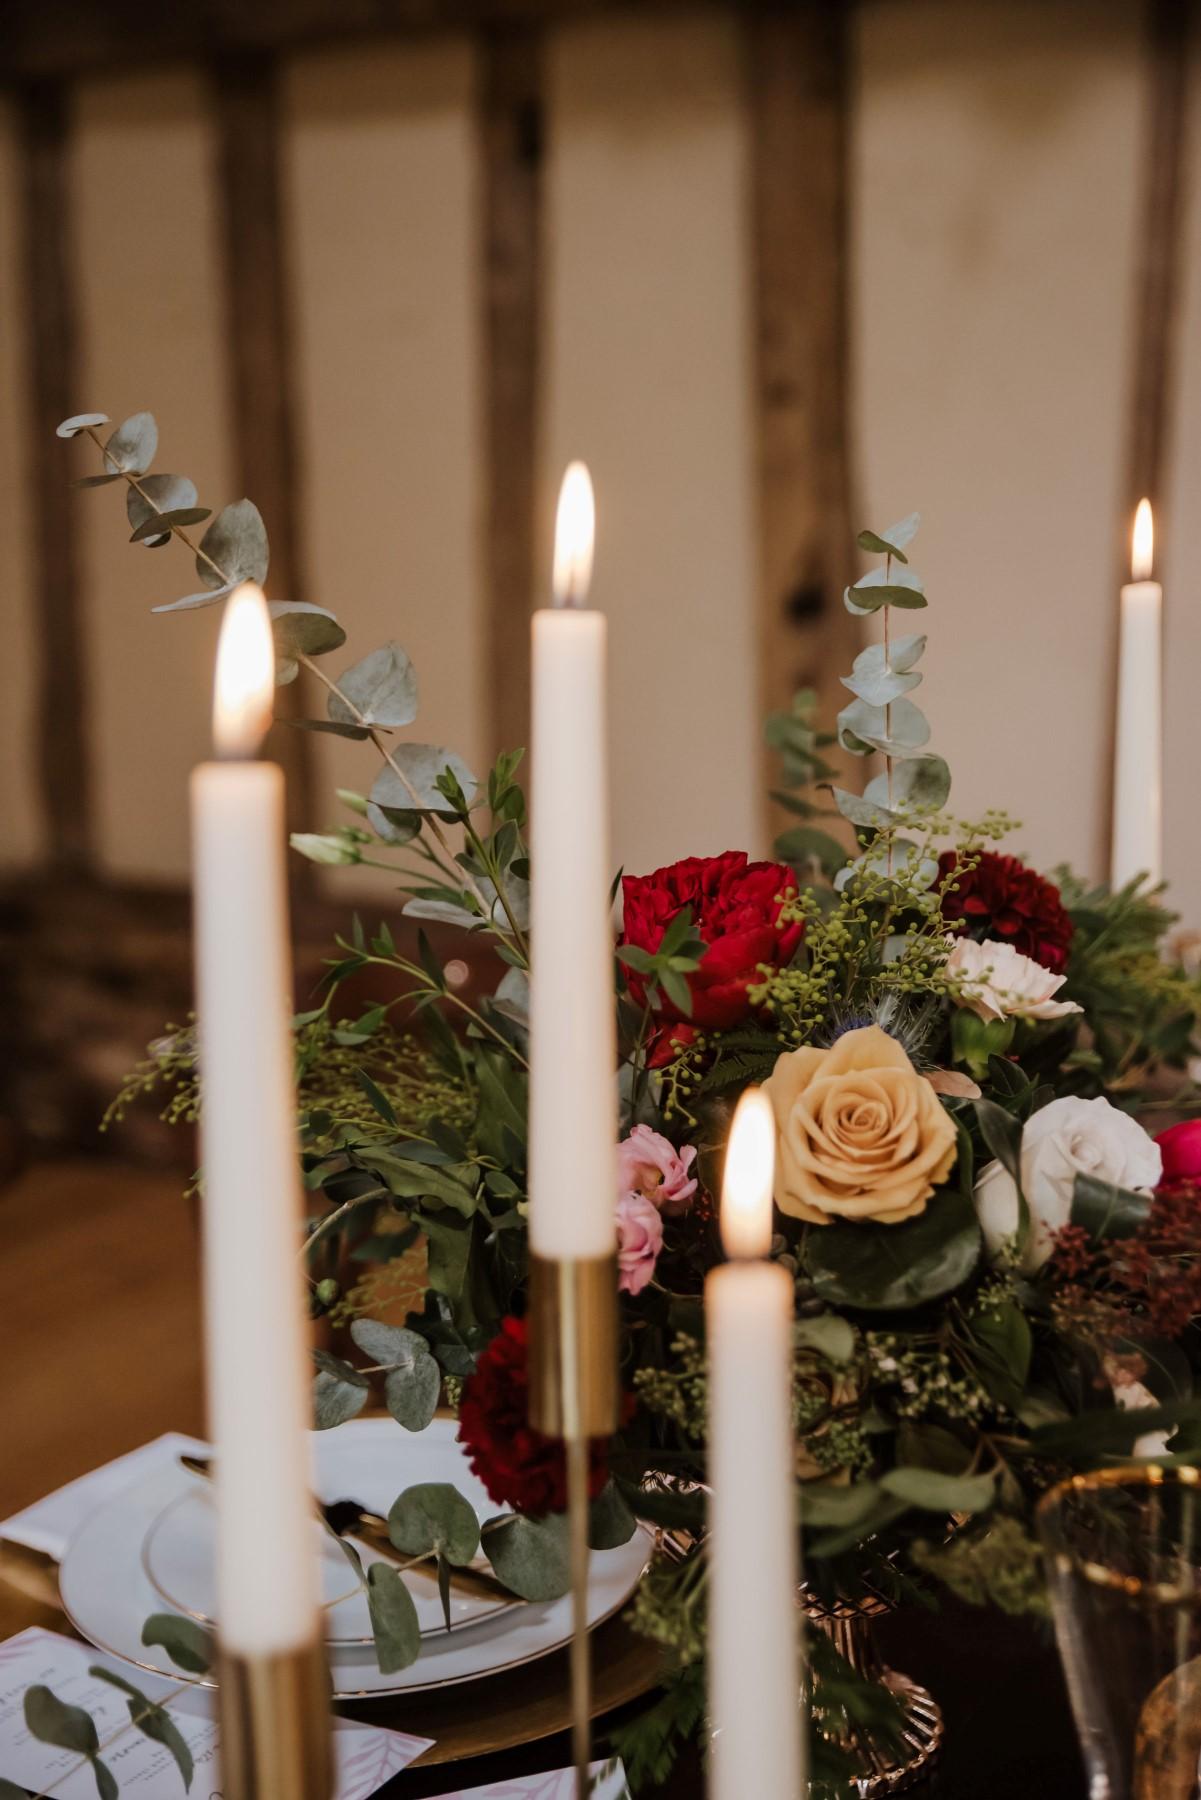 Roshni Photography- Barn Wedding Shoot- Candles